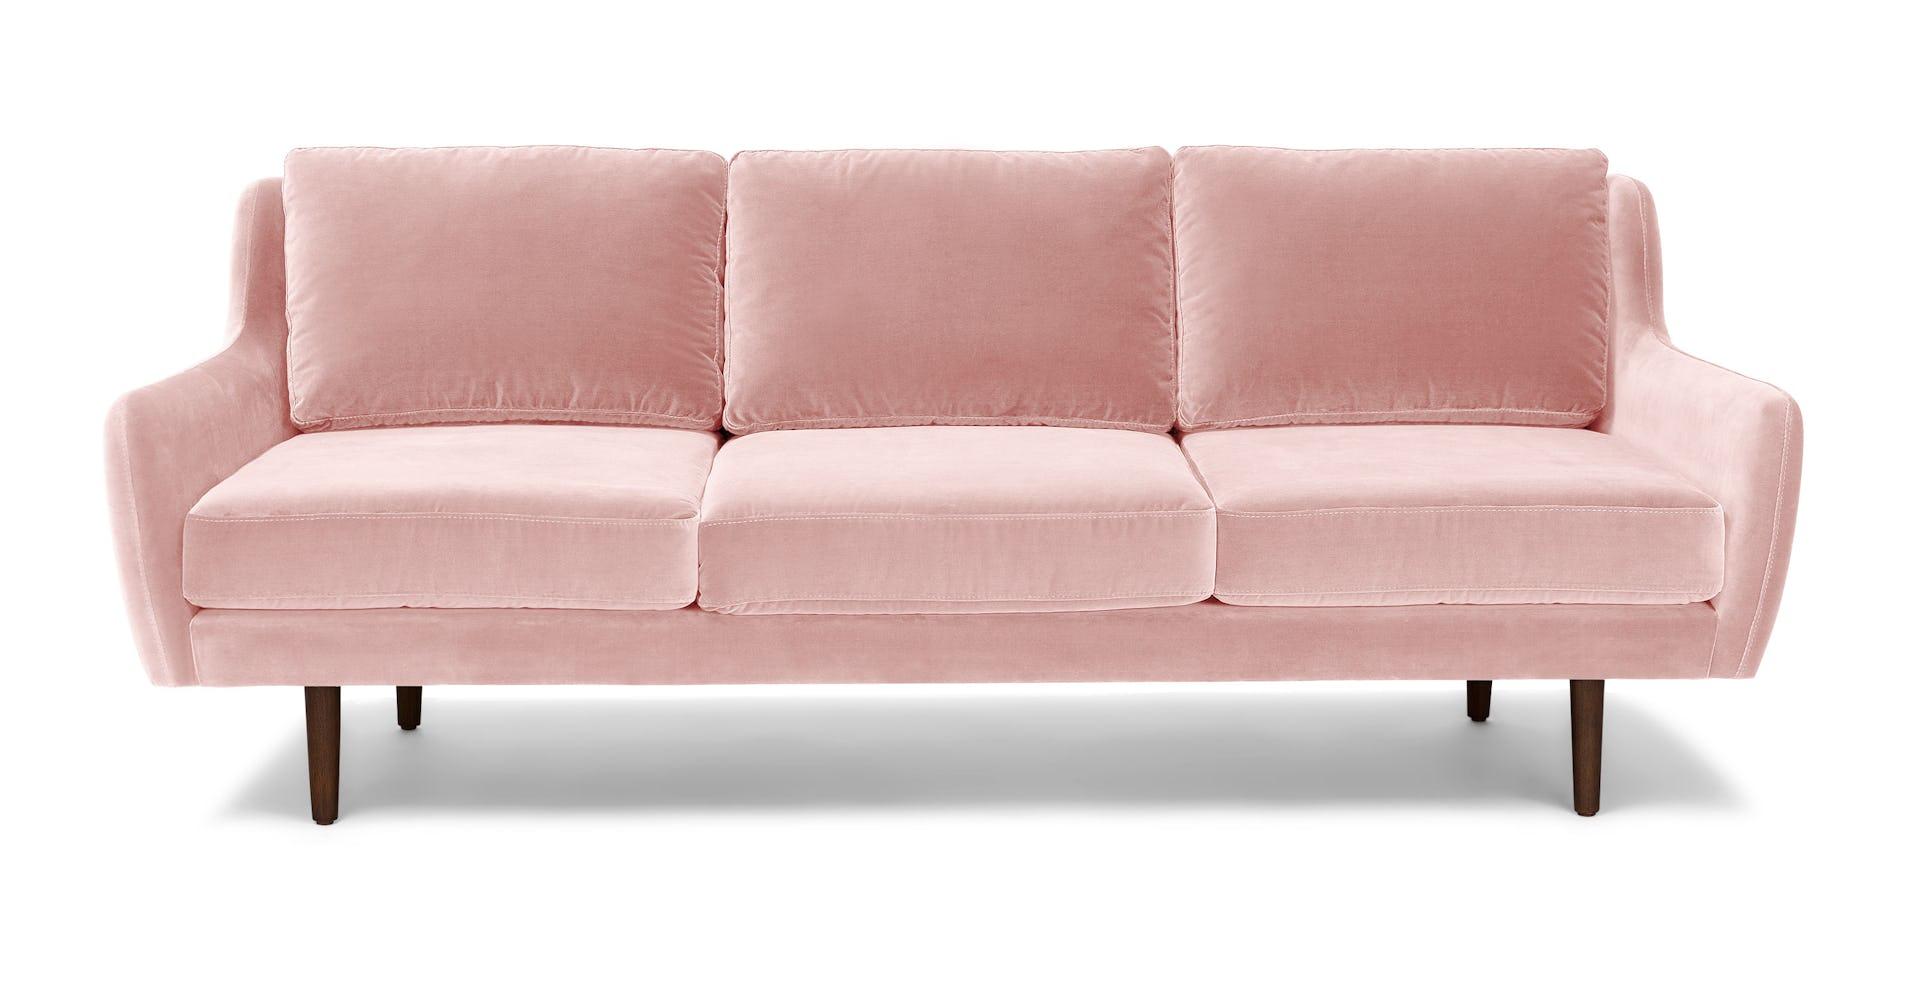 Blush Pink Matrix Velvet 3 Seater Sofa